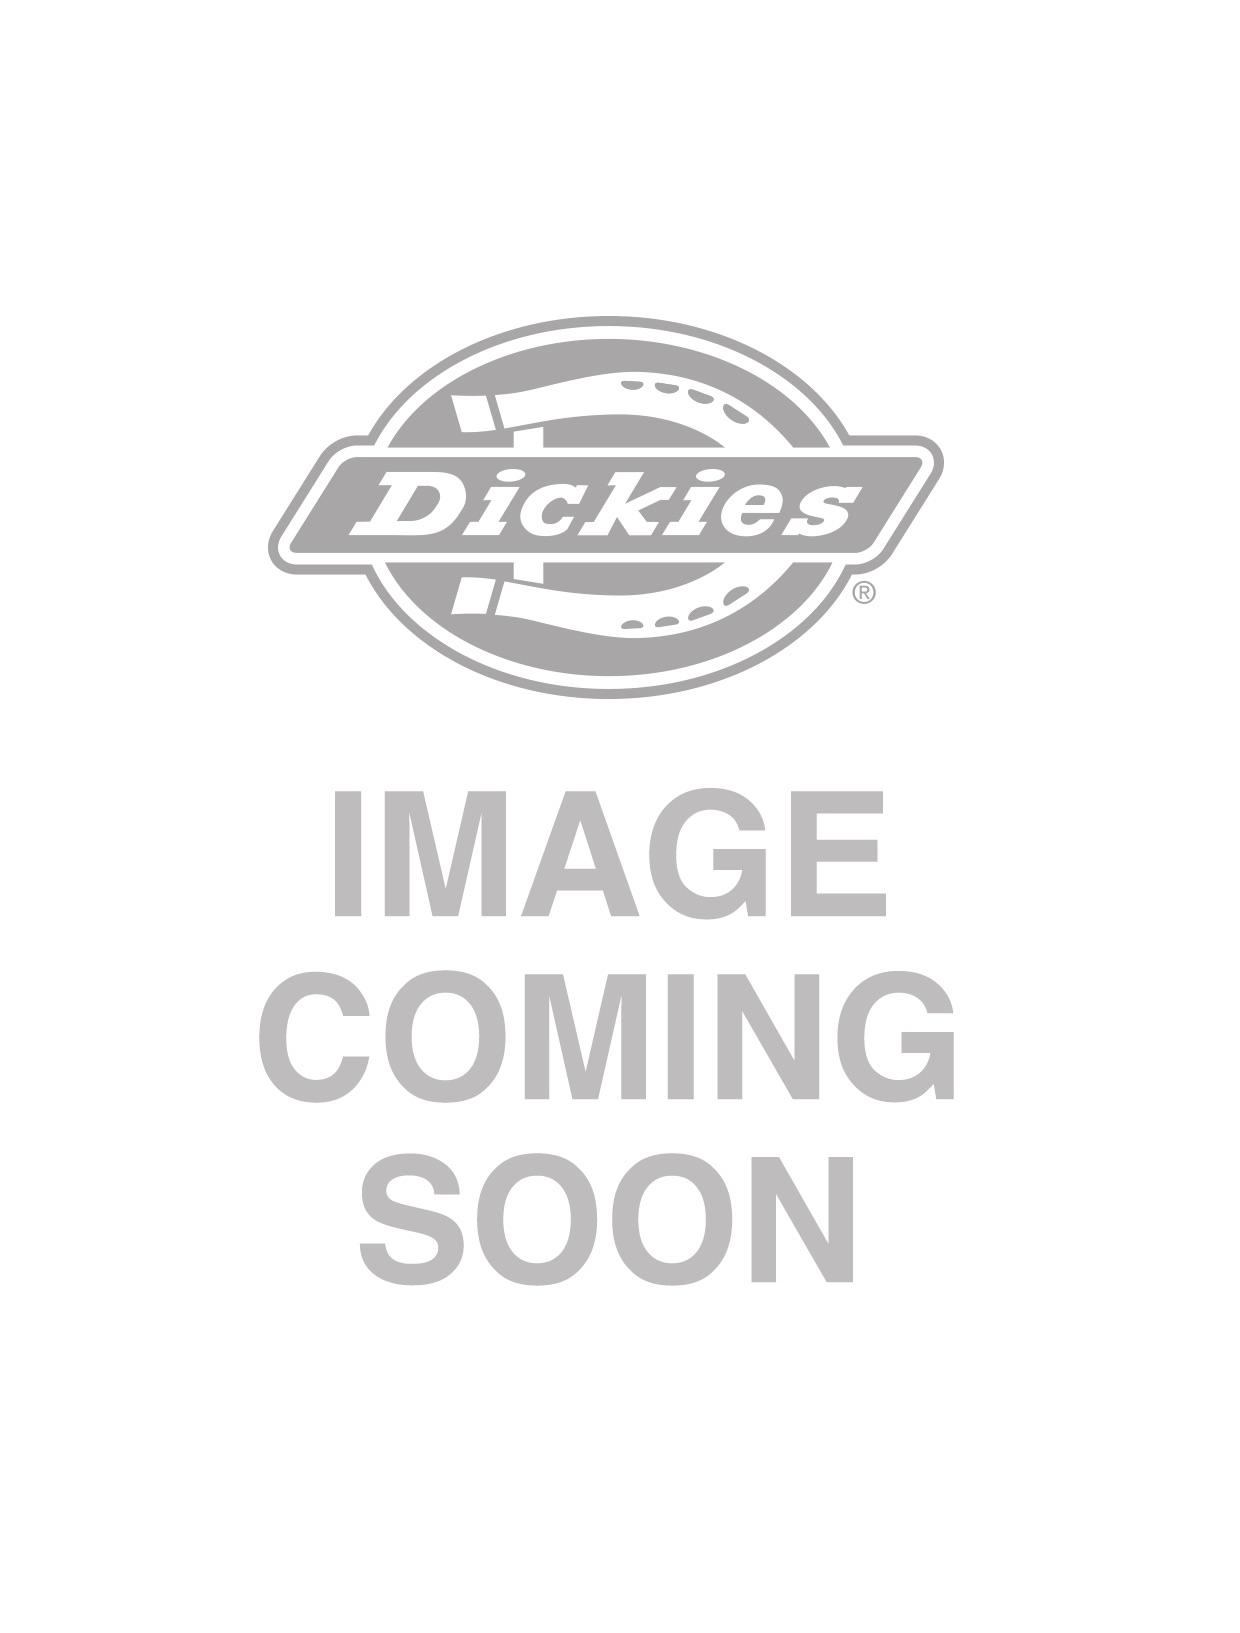 Dickies Womens Philomont T-Shirt